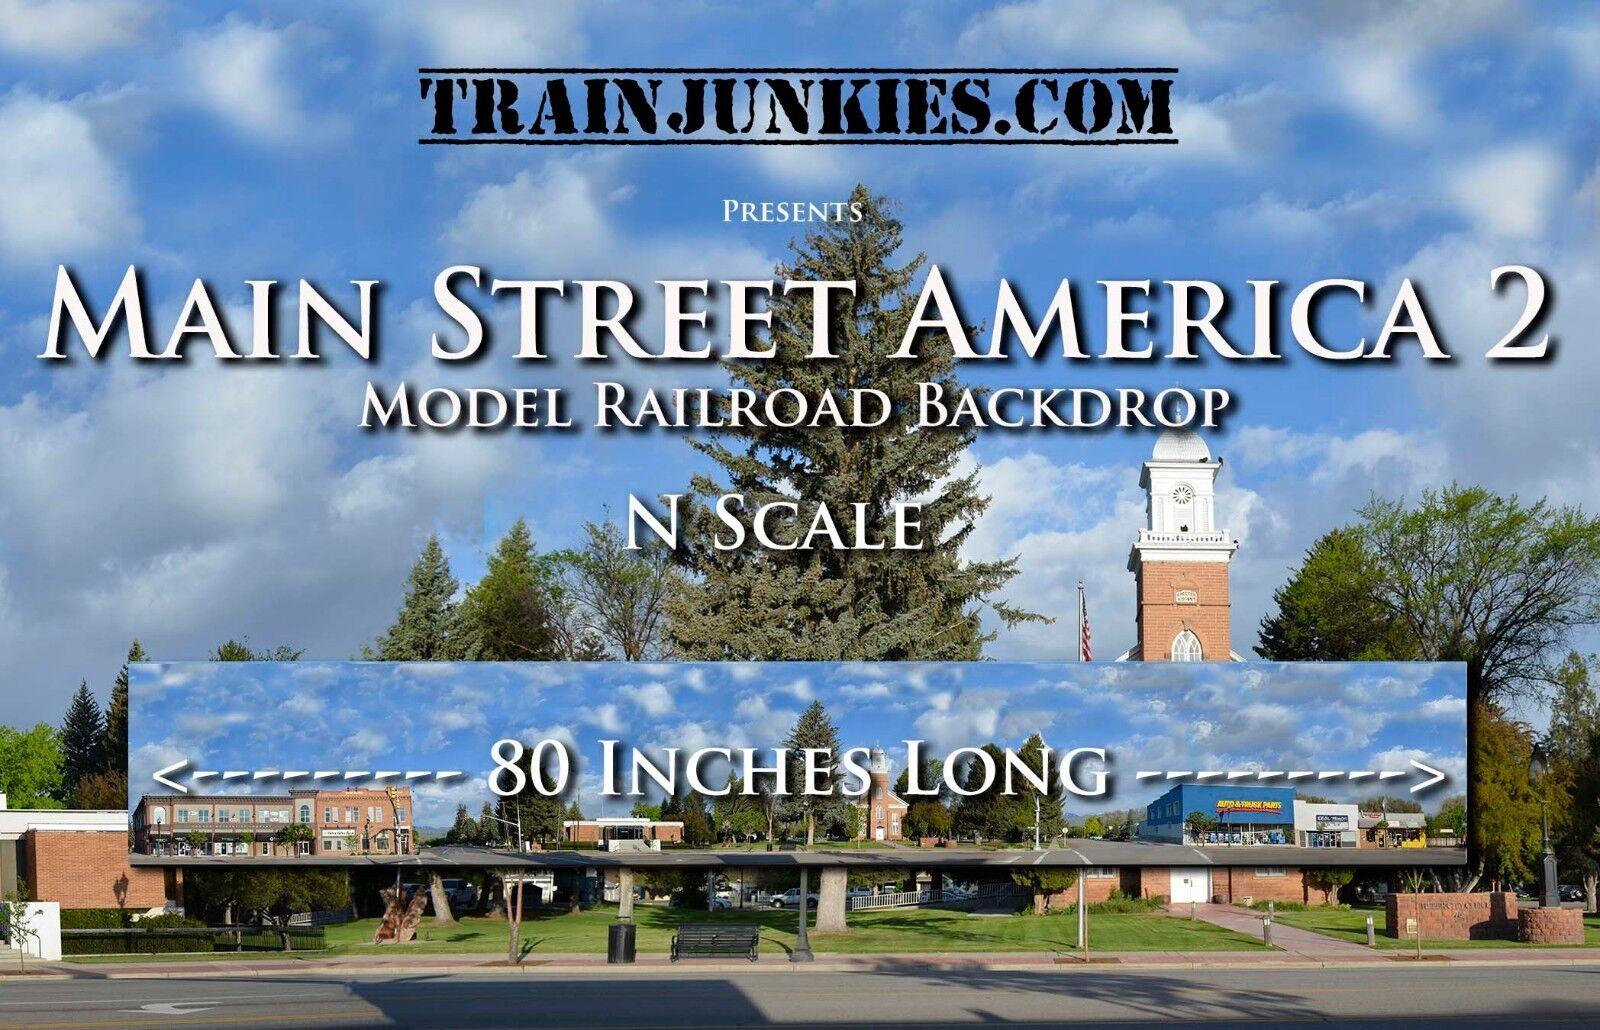 Venta en línea precio bajo descuento Trainjunkies N scale  Main Street America 2  modelo modelo modelo del ferroCocheril telón de fondo 12x80   ¡envío gratis!